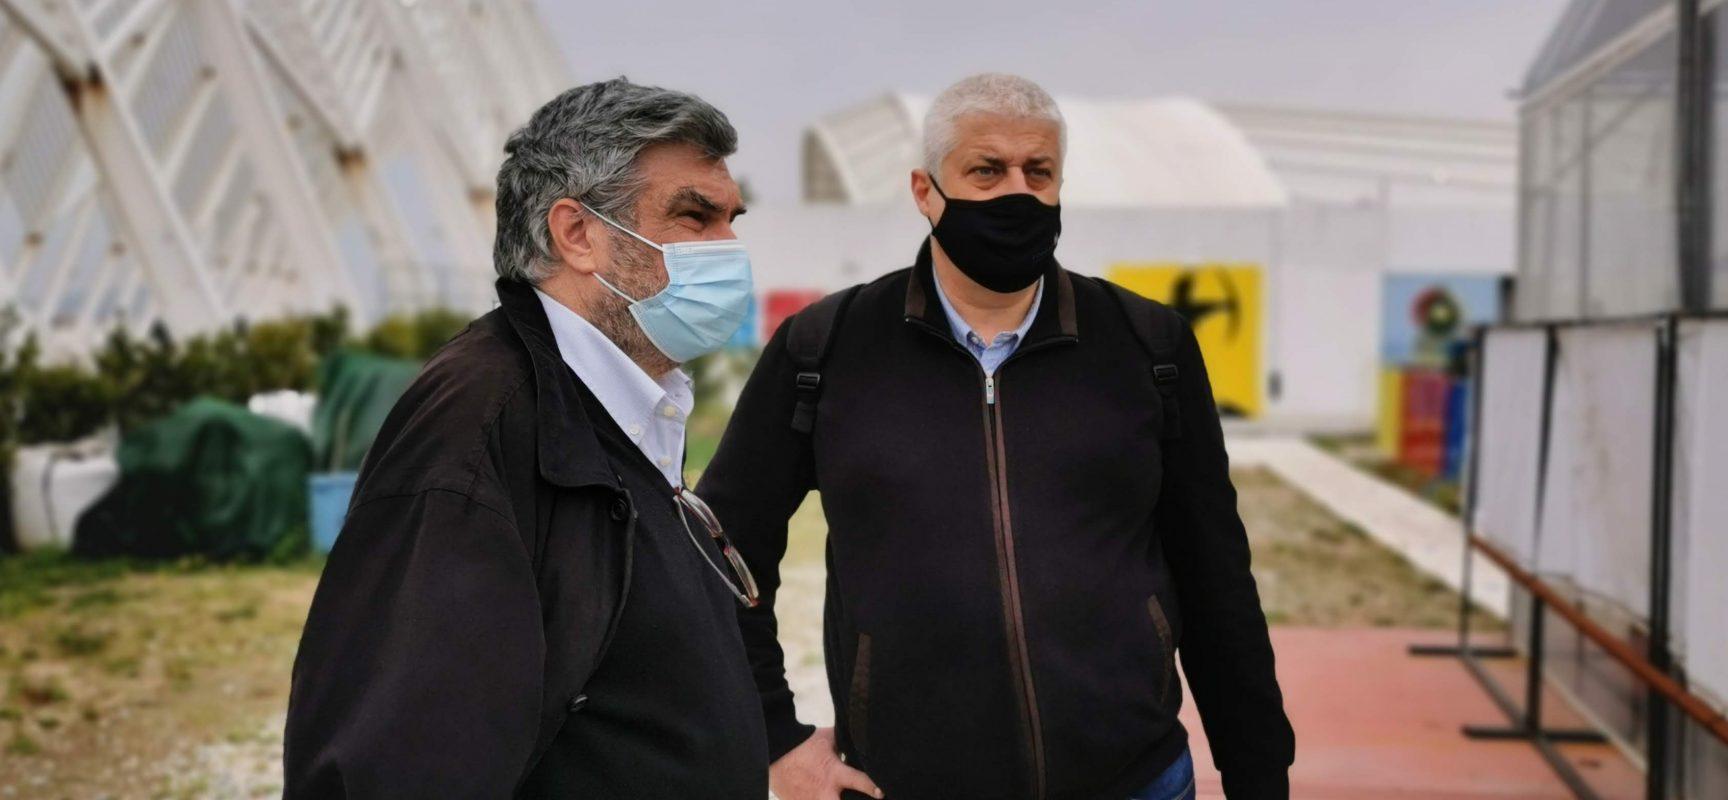 O Τάσος Χρυσανθόπουλος Πρόεδρος της ΕΟΤ, ο Πέτρος Συναδινόςεκπρόσωπος στην ΕΟΕ